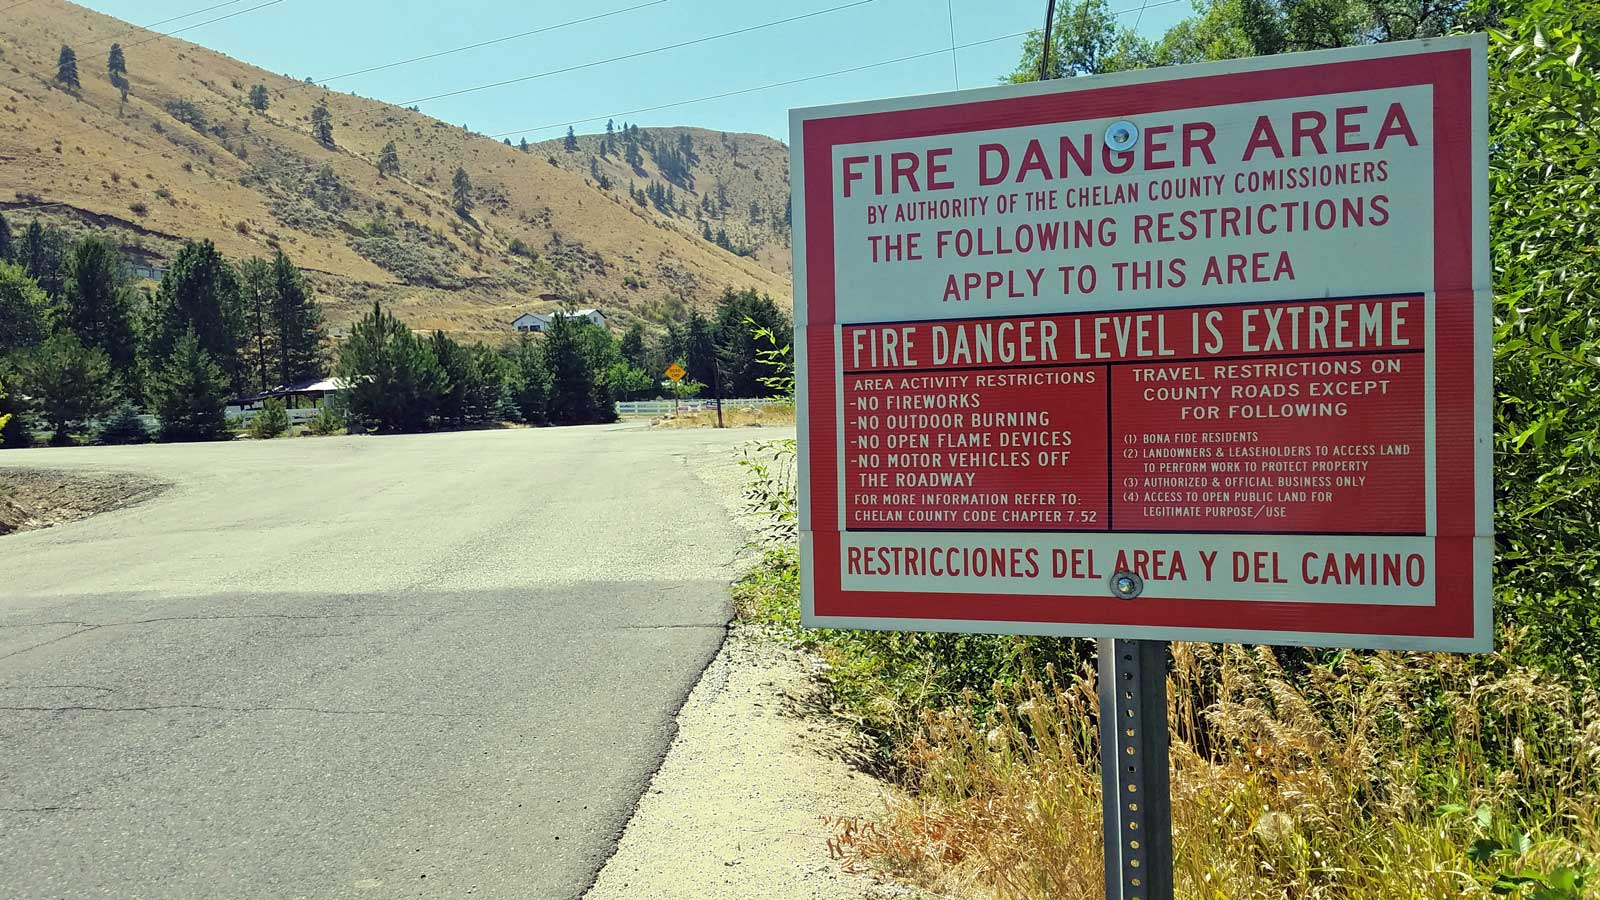 Chelan County Fire Hazard Designation - July 19, 2021